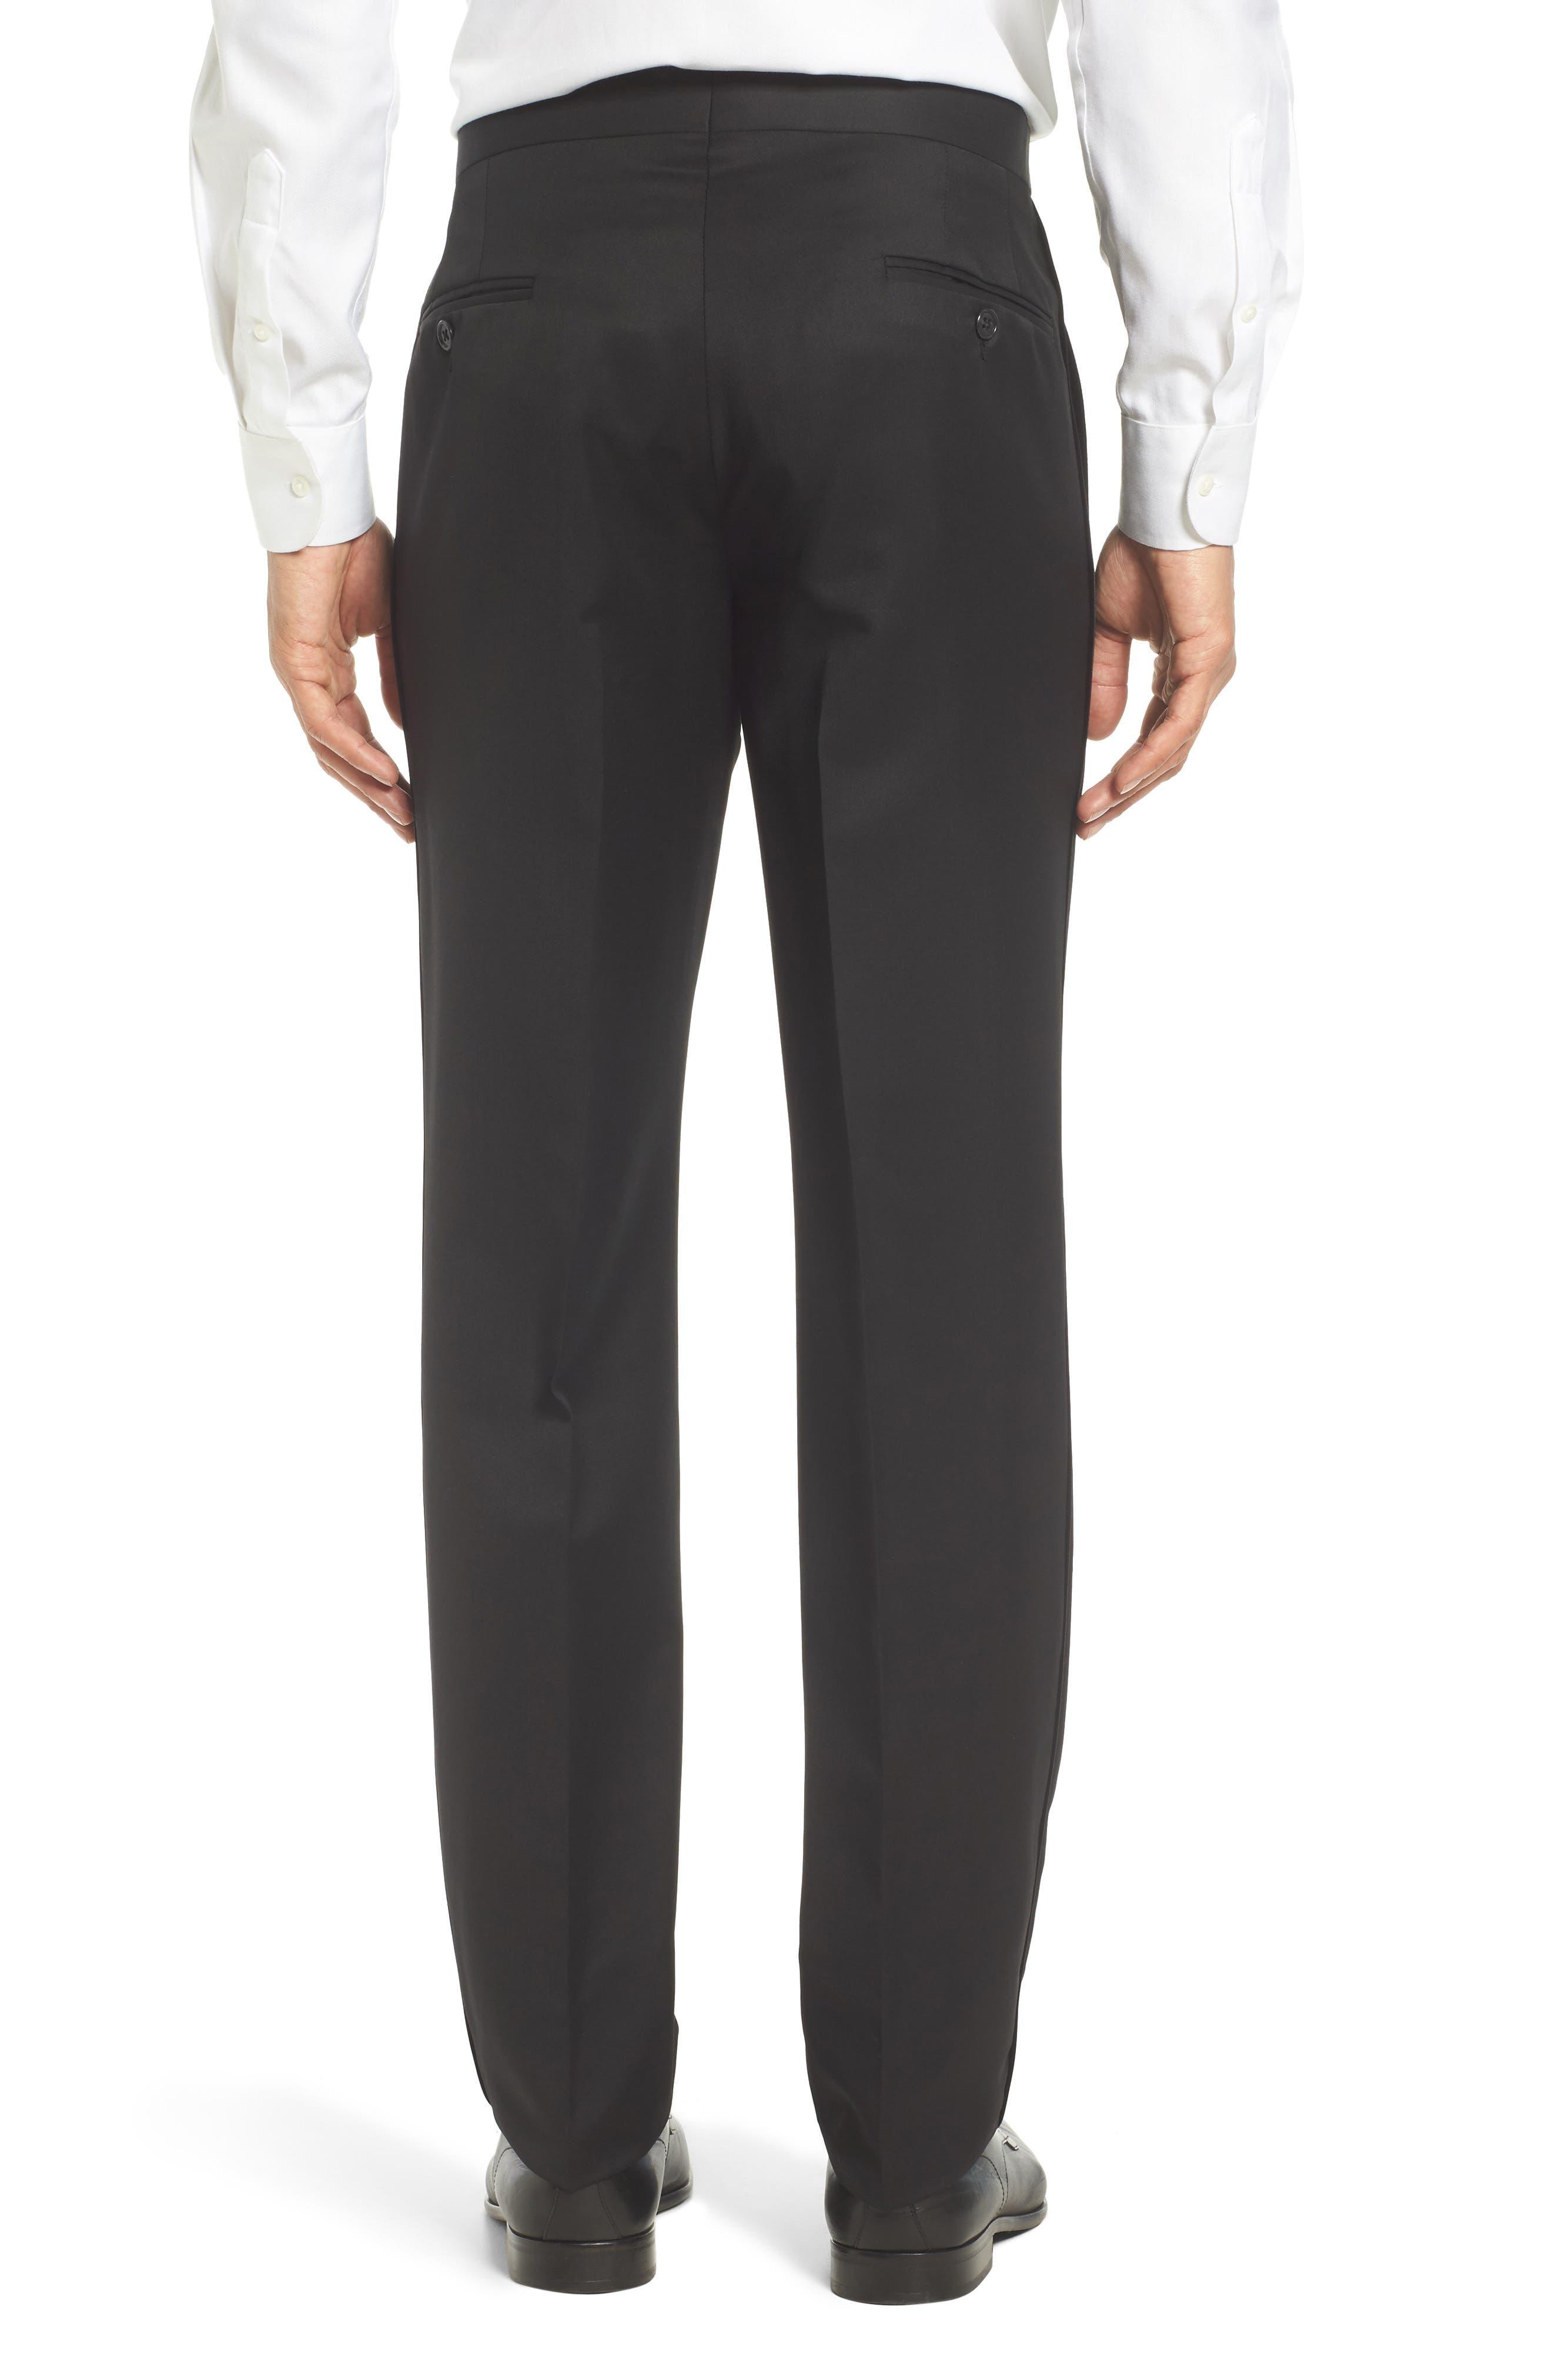 TED BAKER LONDON, Josh Flat Front Wool & Mohair Tuxedo Pants, Alternate thumbnail 3, color, BLACK